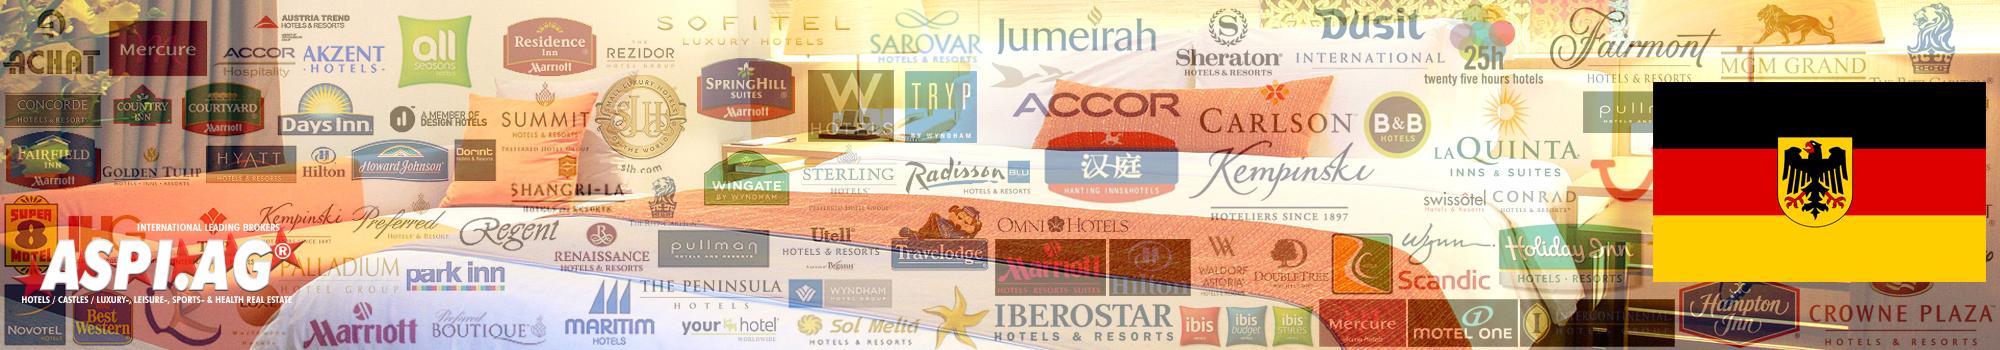 Hotel for sale for lease in Germany, Bavaria, Munich, Hamburg, Berlin, Frankfurt, Stuttgart, Köln, Düsseldorf